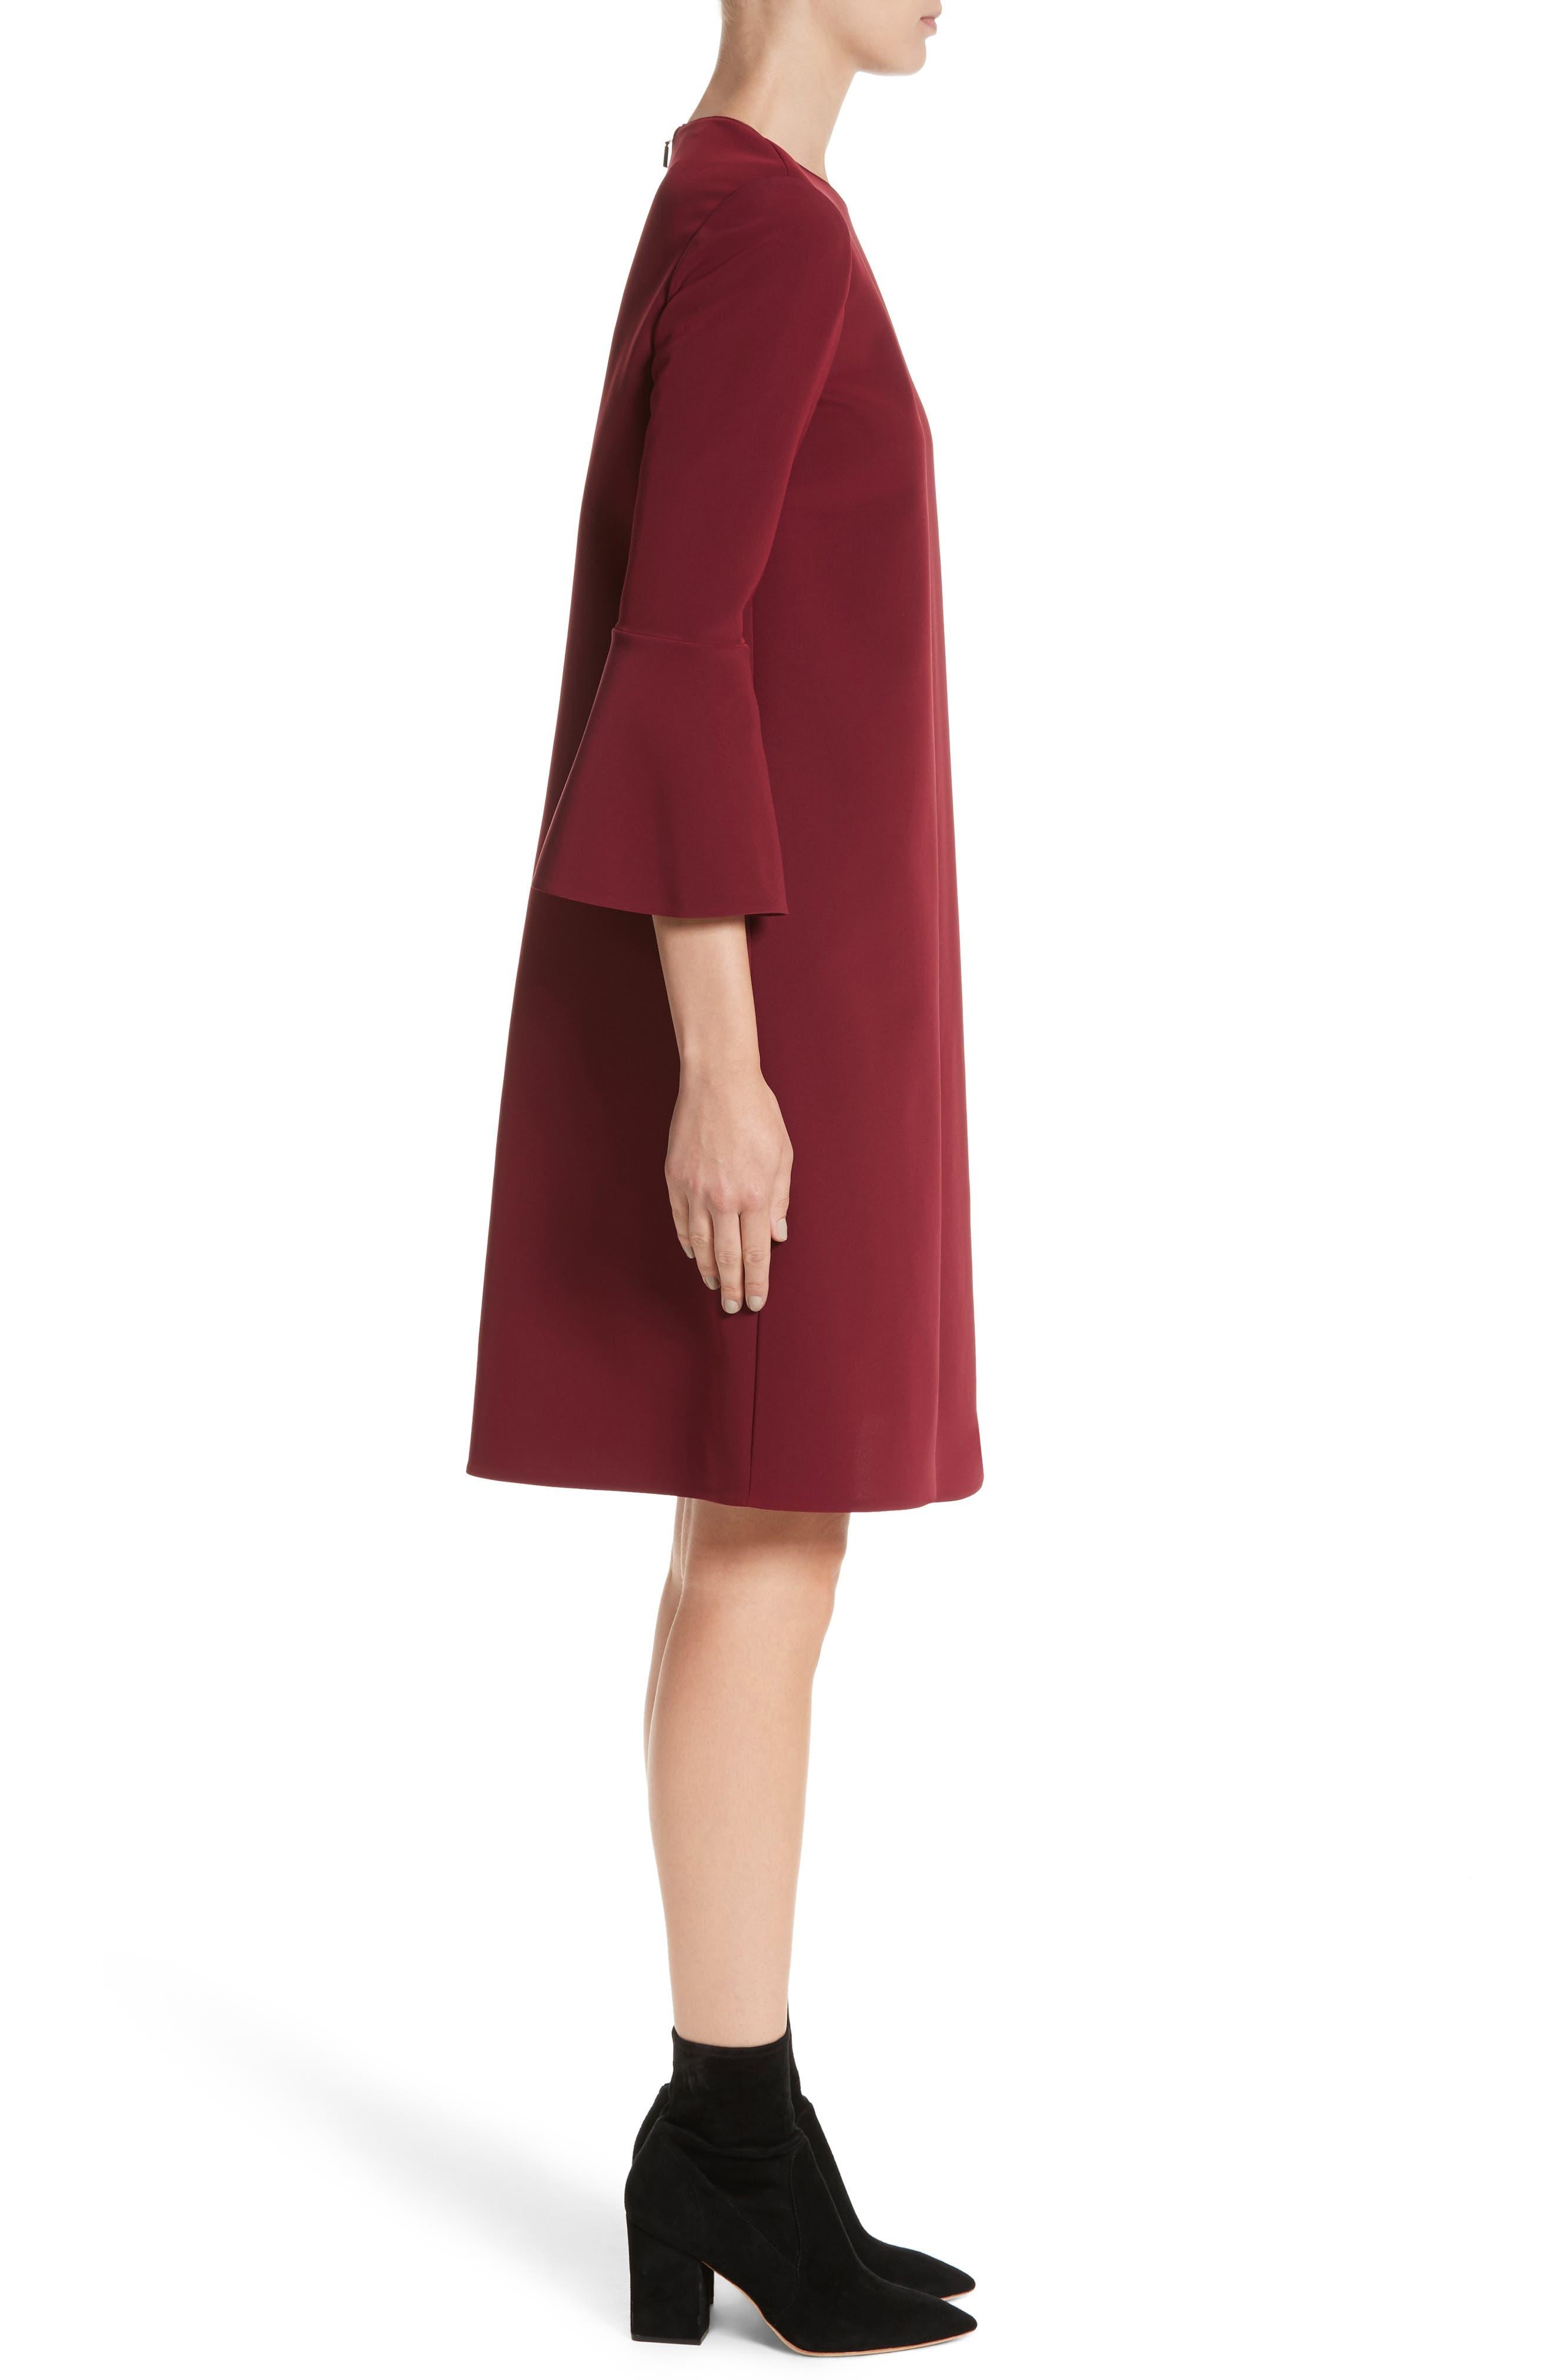 Sidra Emory Cloth Dress,                             Alternate thumbnail 3, color,                             930